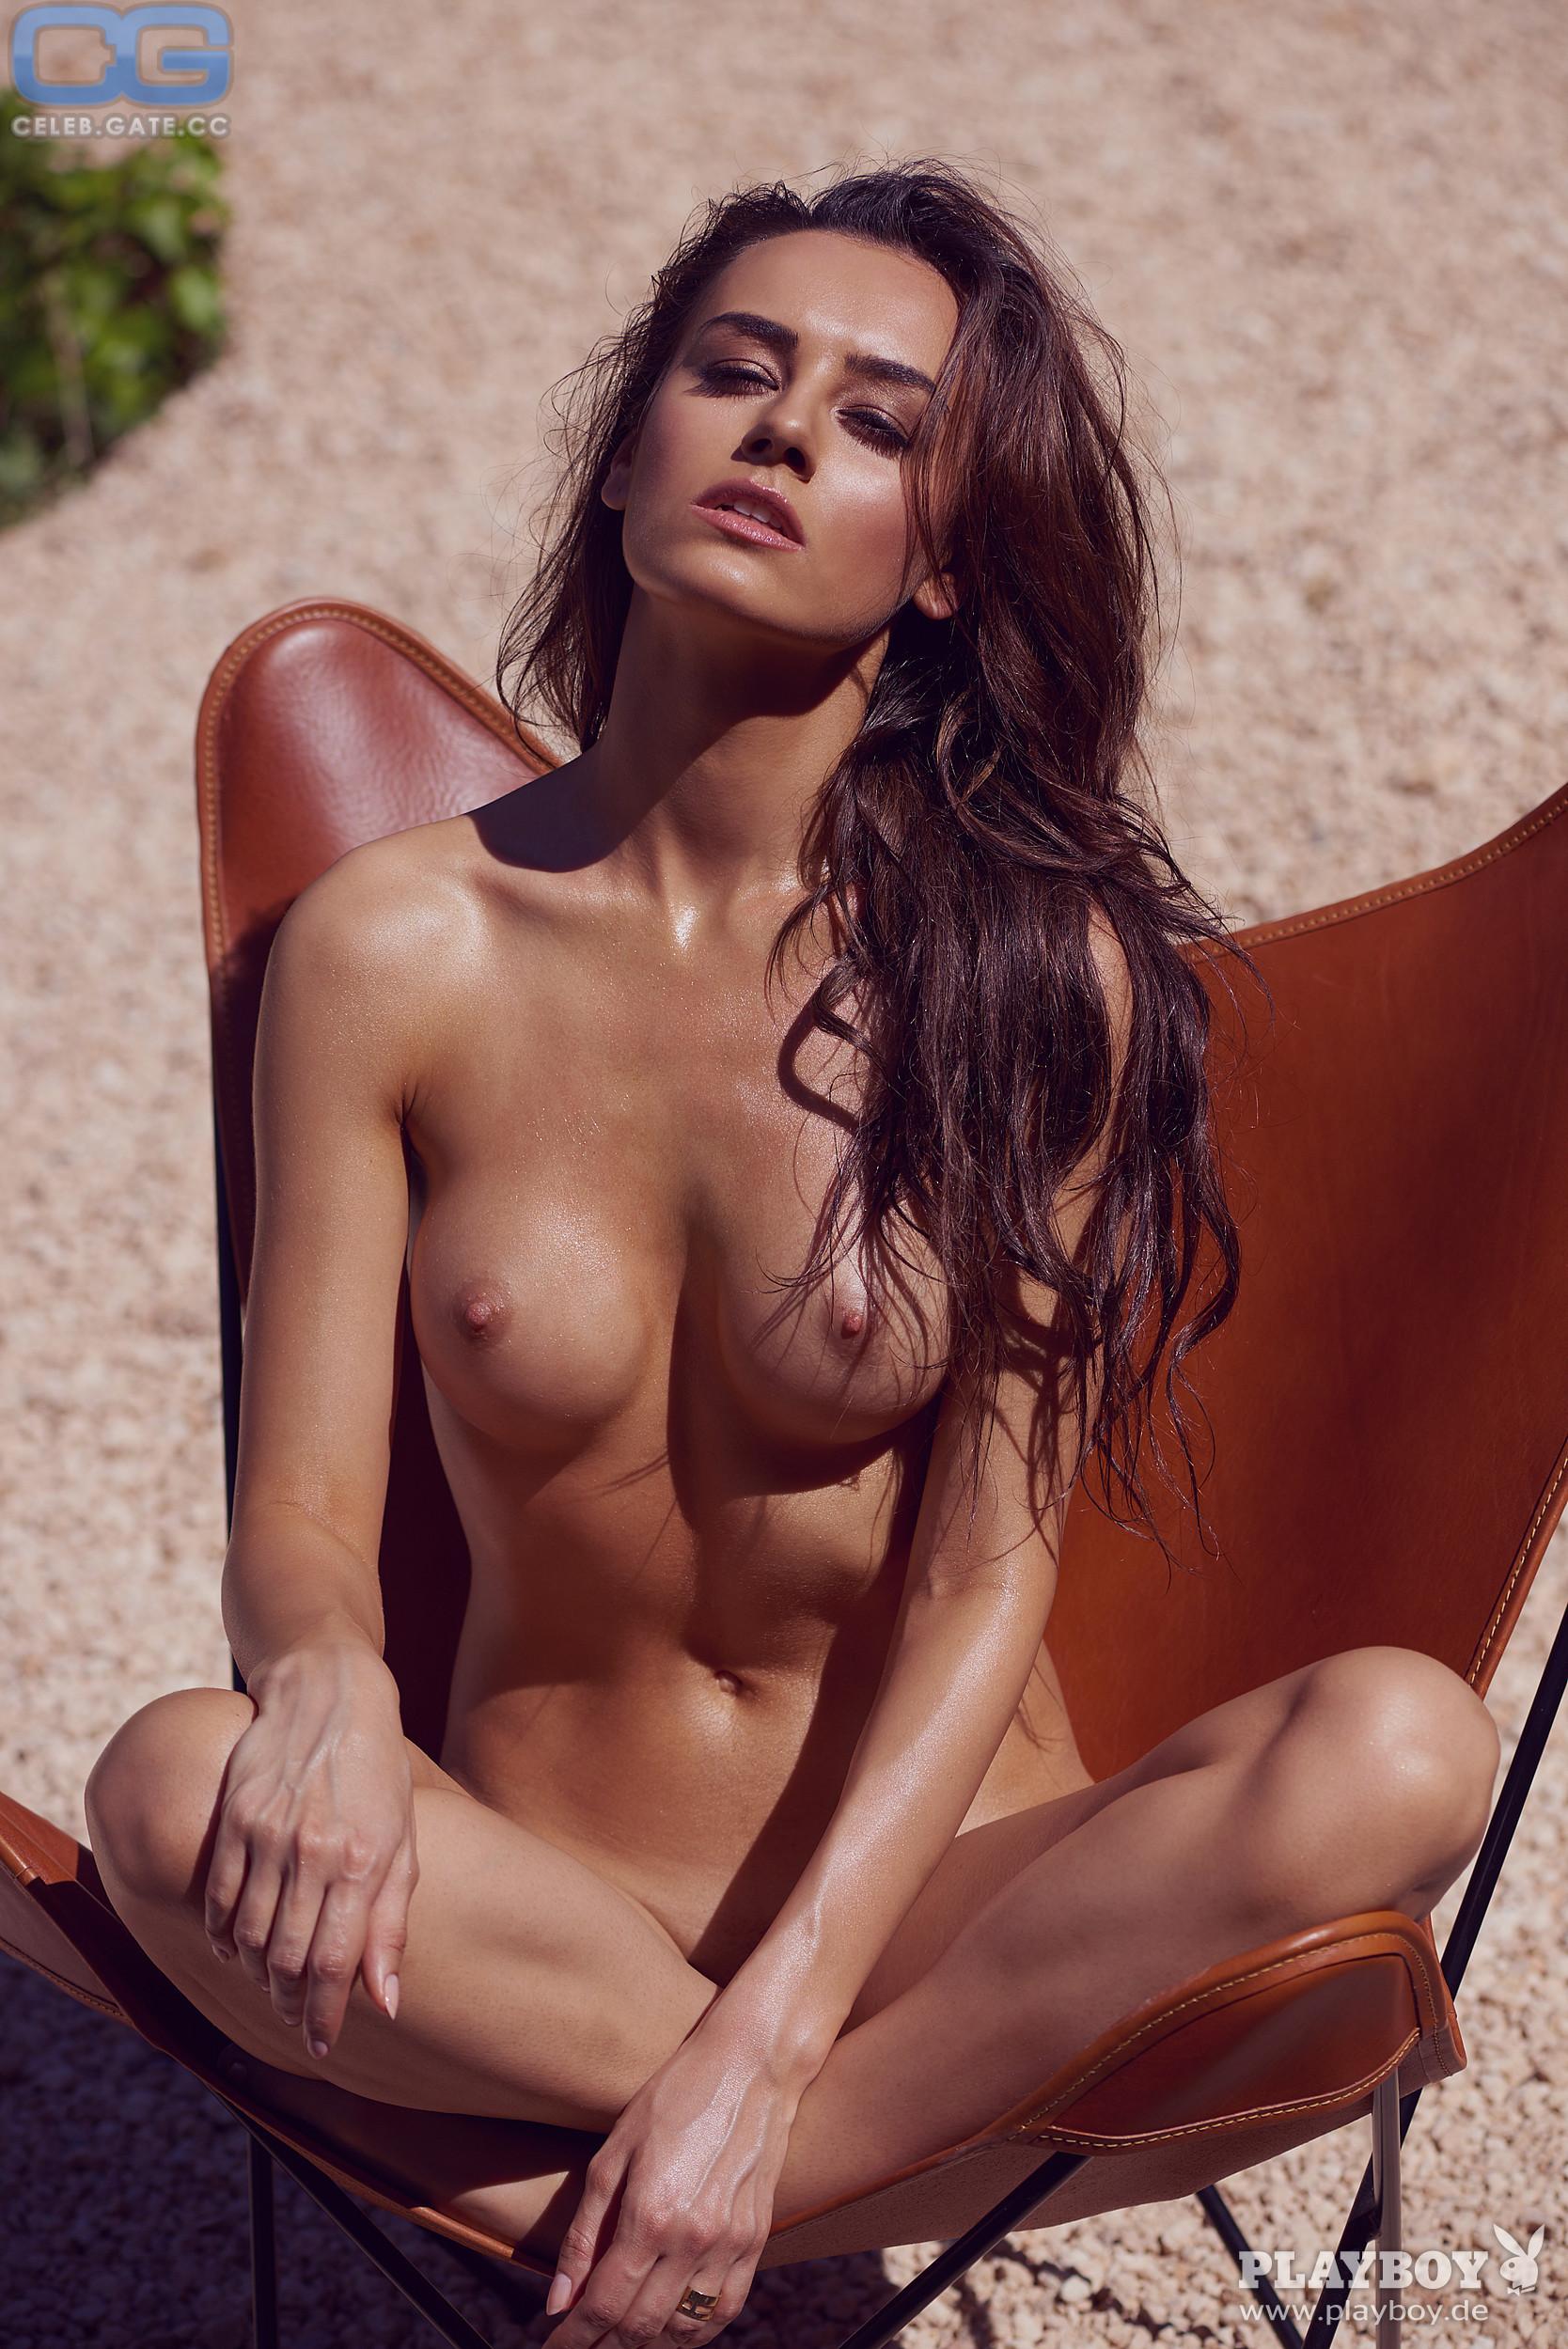 Viktoria rowell nackt